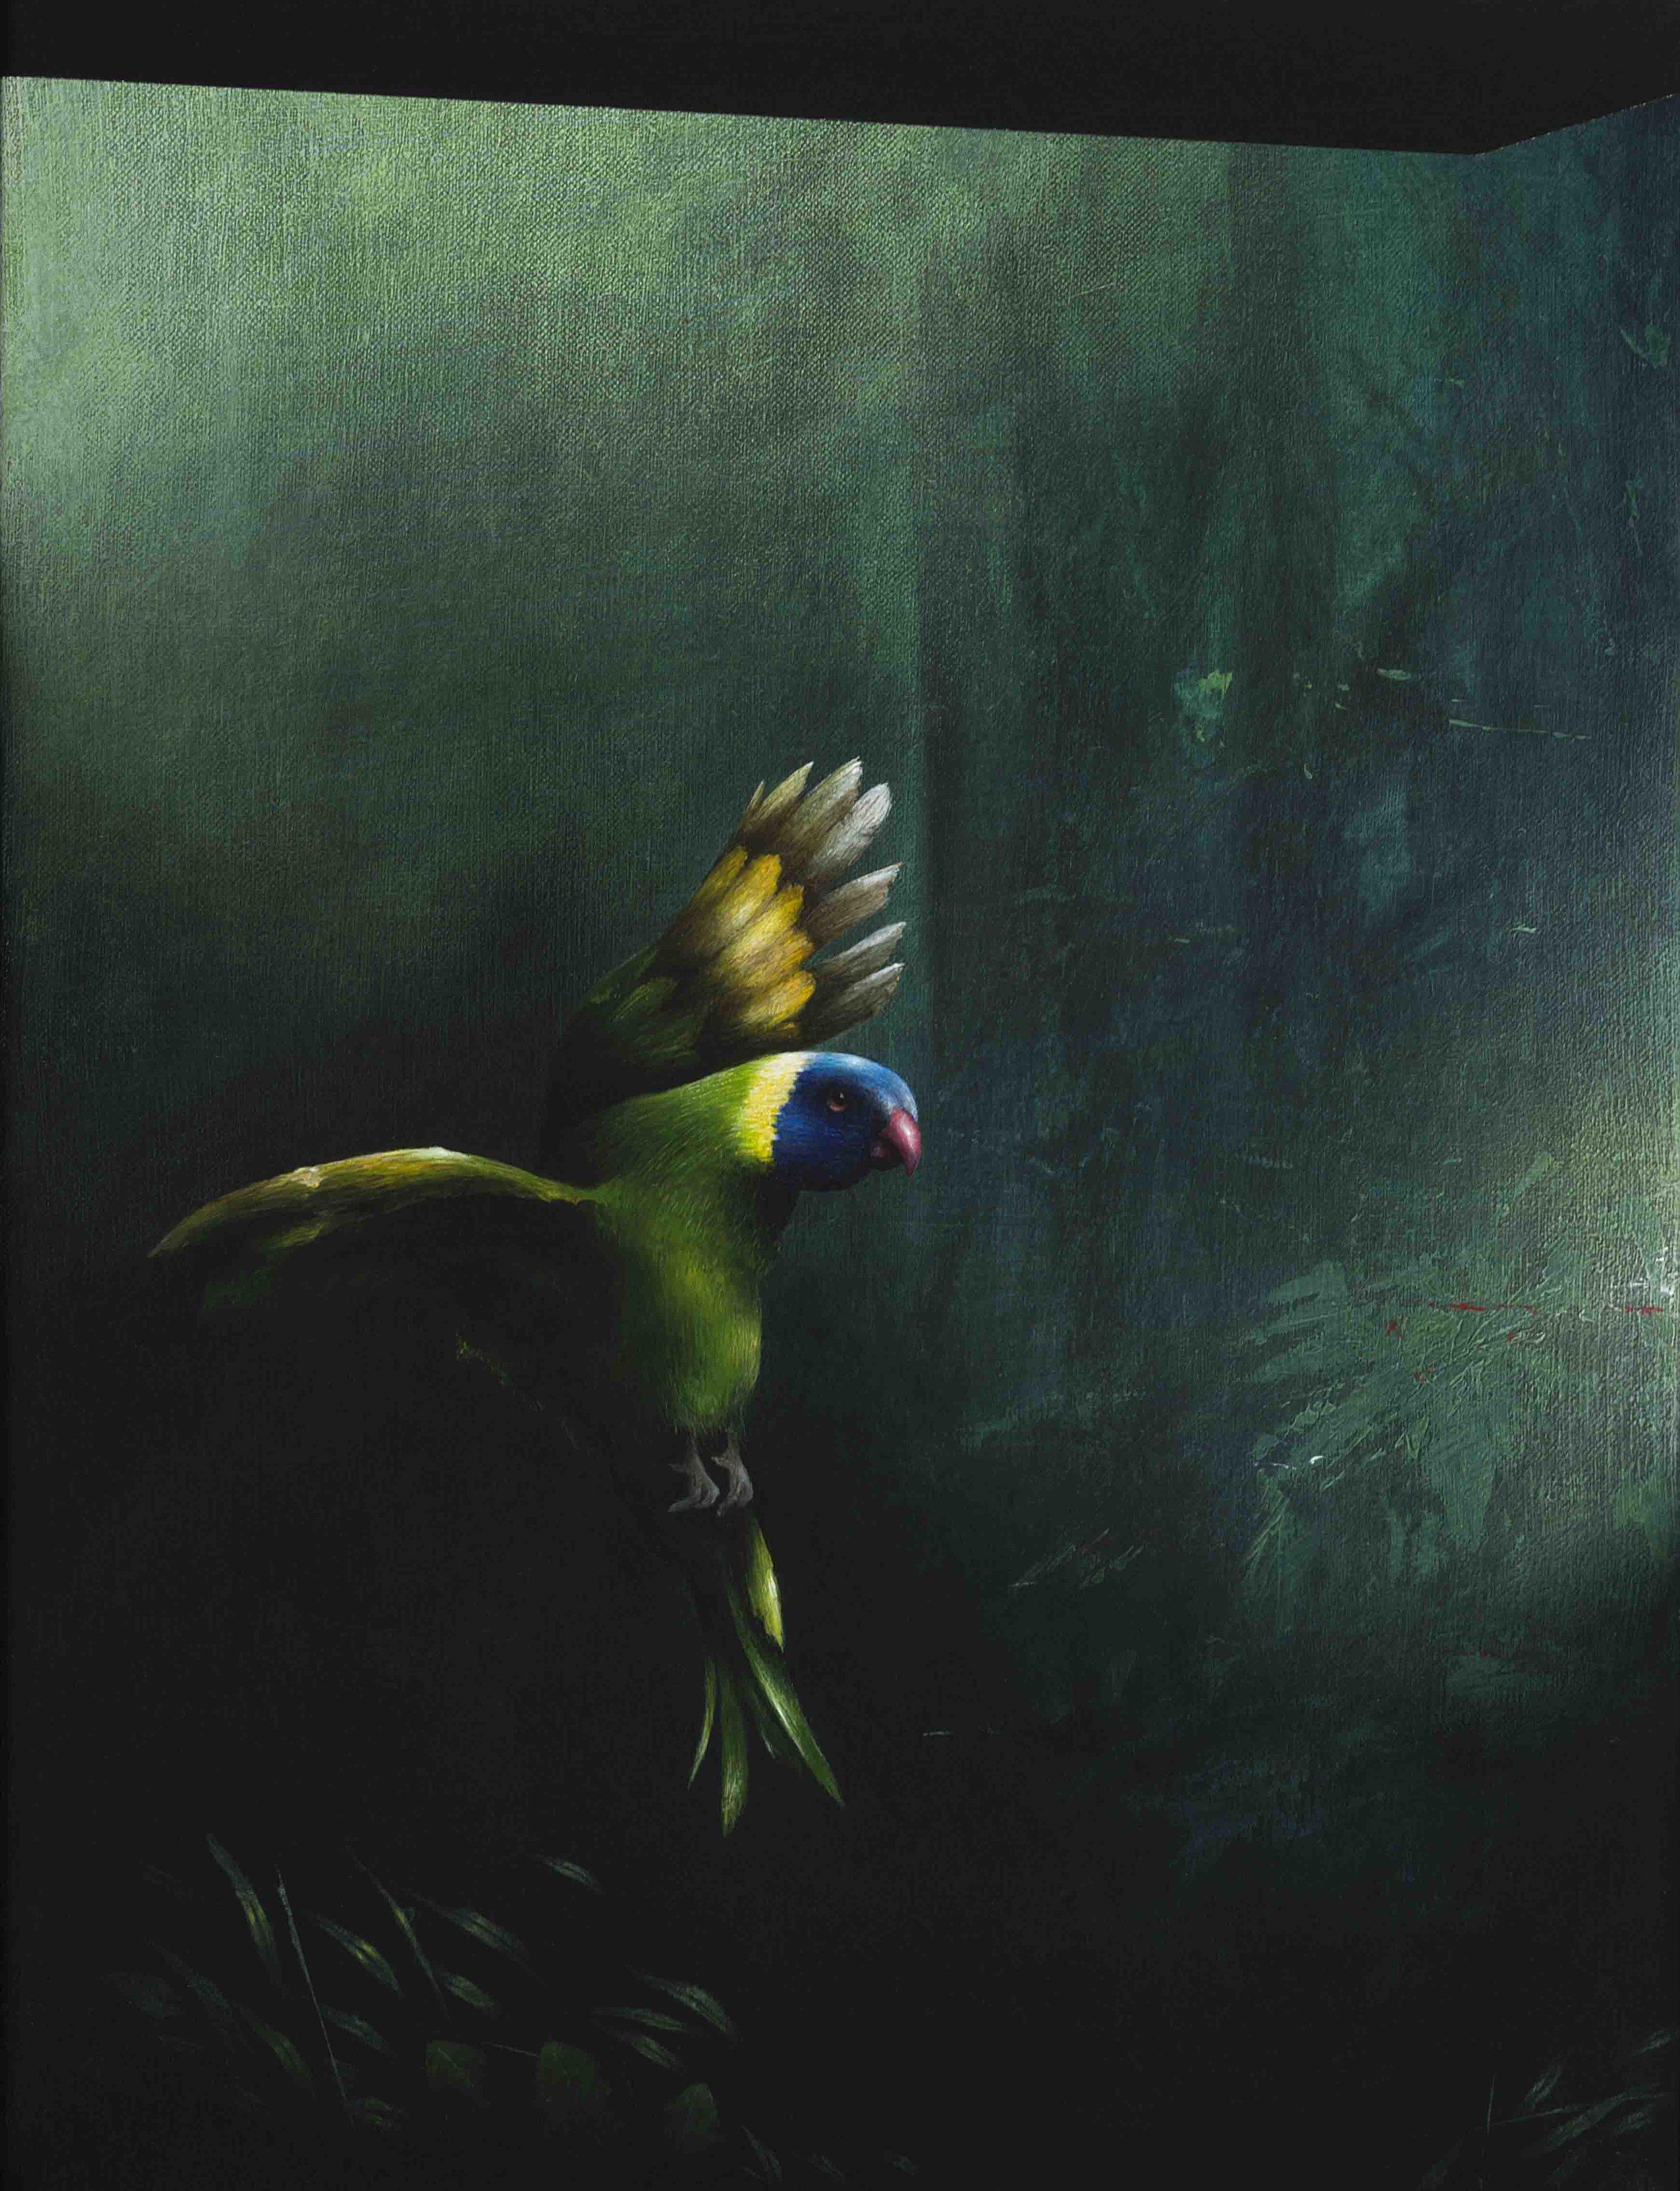 Jarek Wojcik, Presque Vu , 2016, acrylic on linen, 41 x 31cm